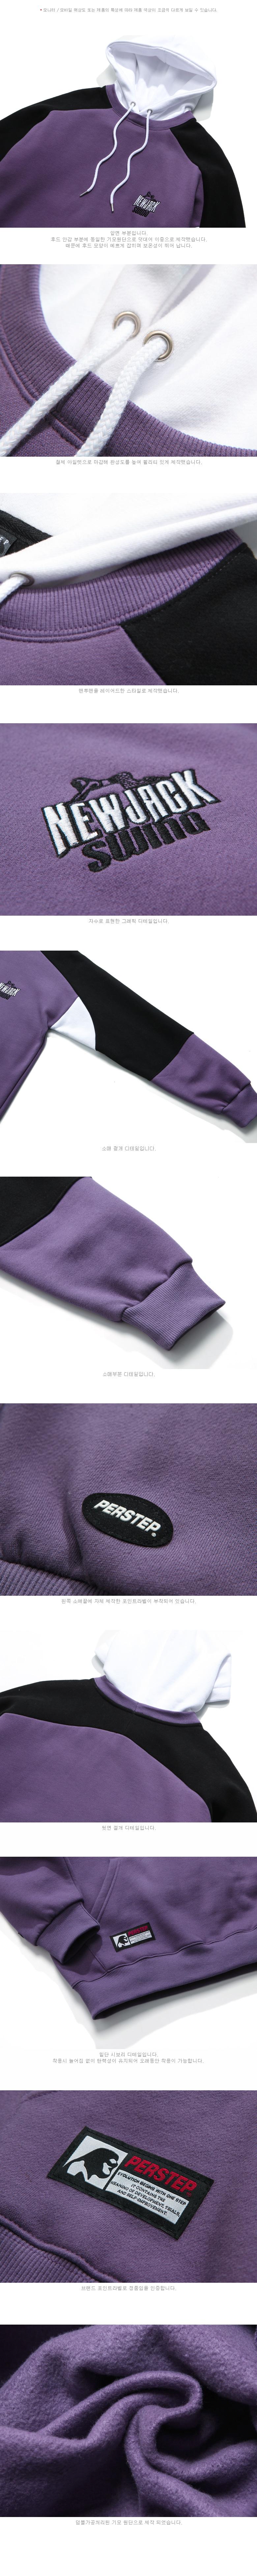 20180820_ps_burning_purple_ms_02.jpg